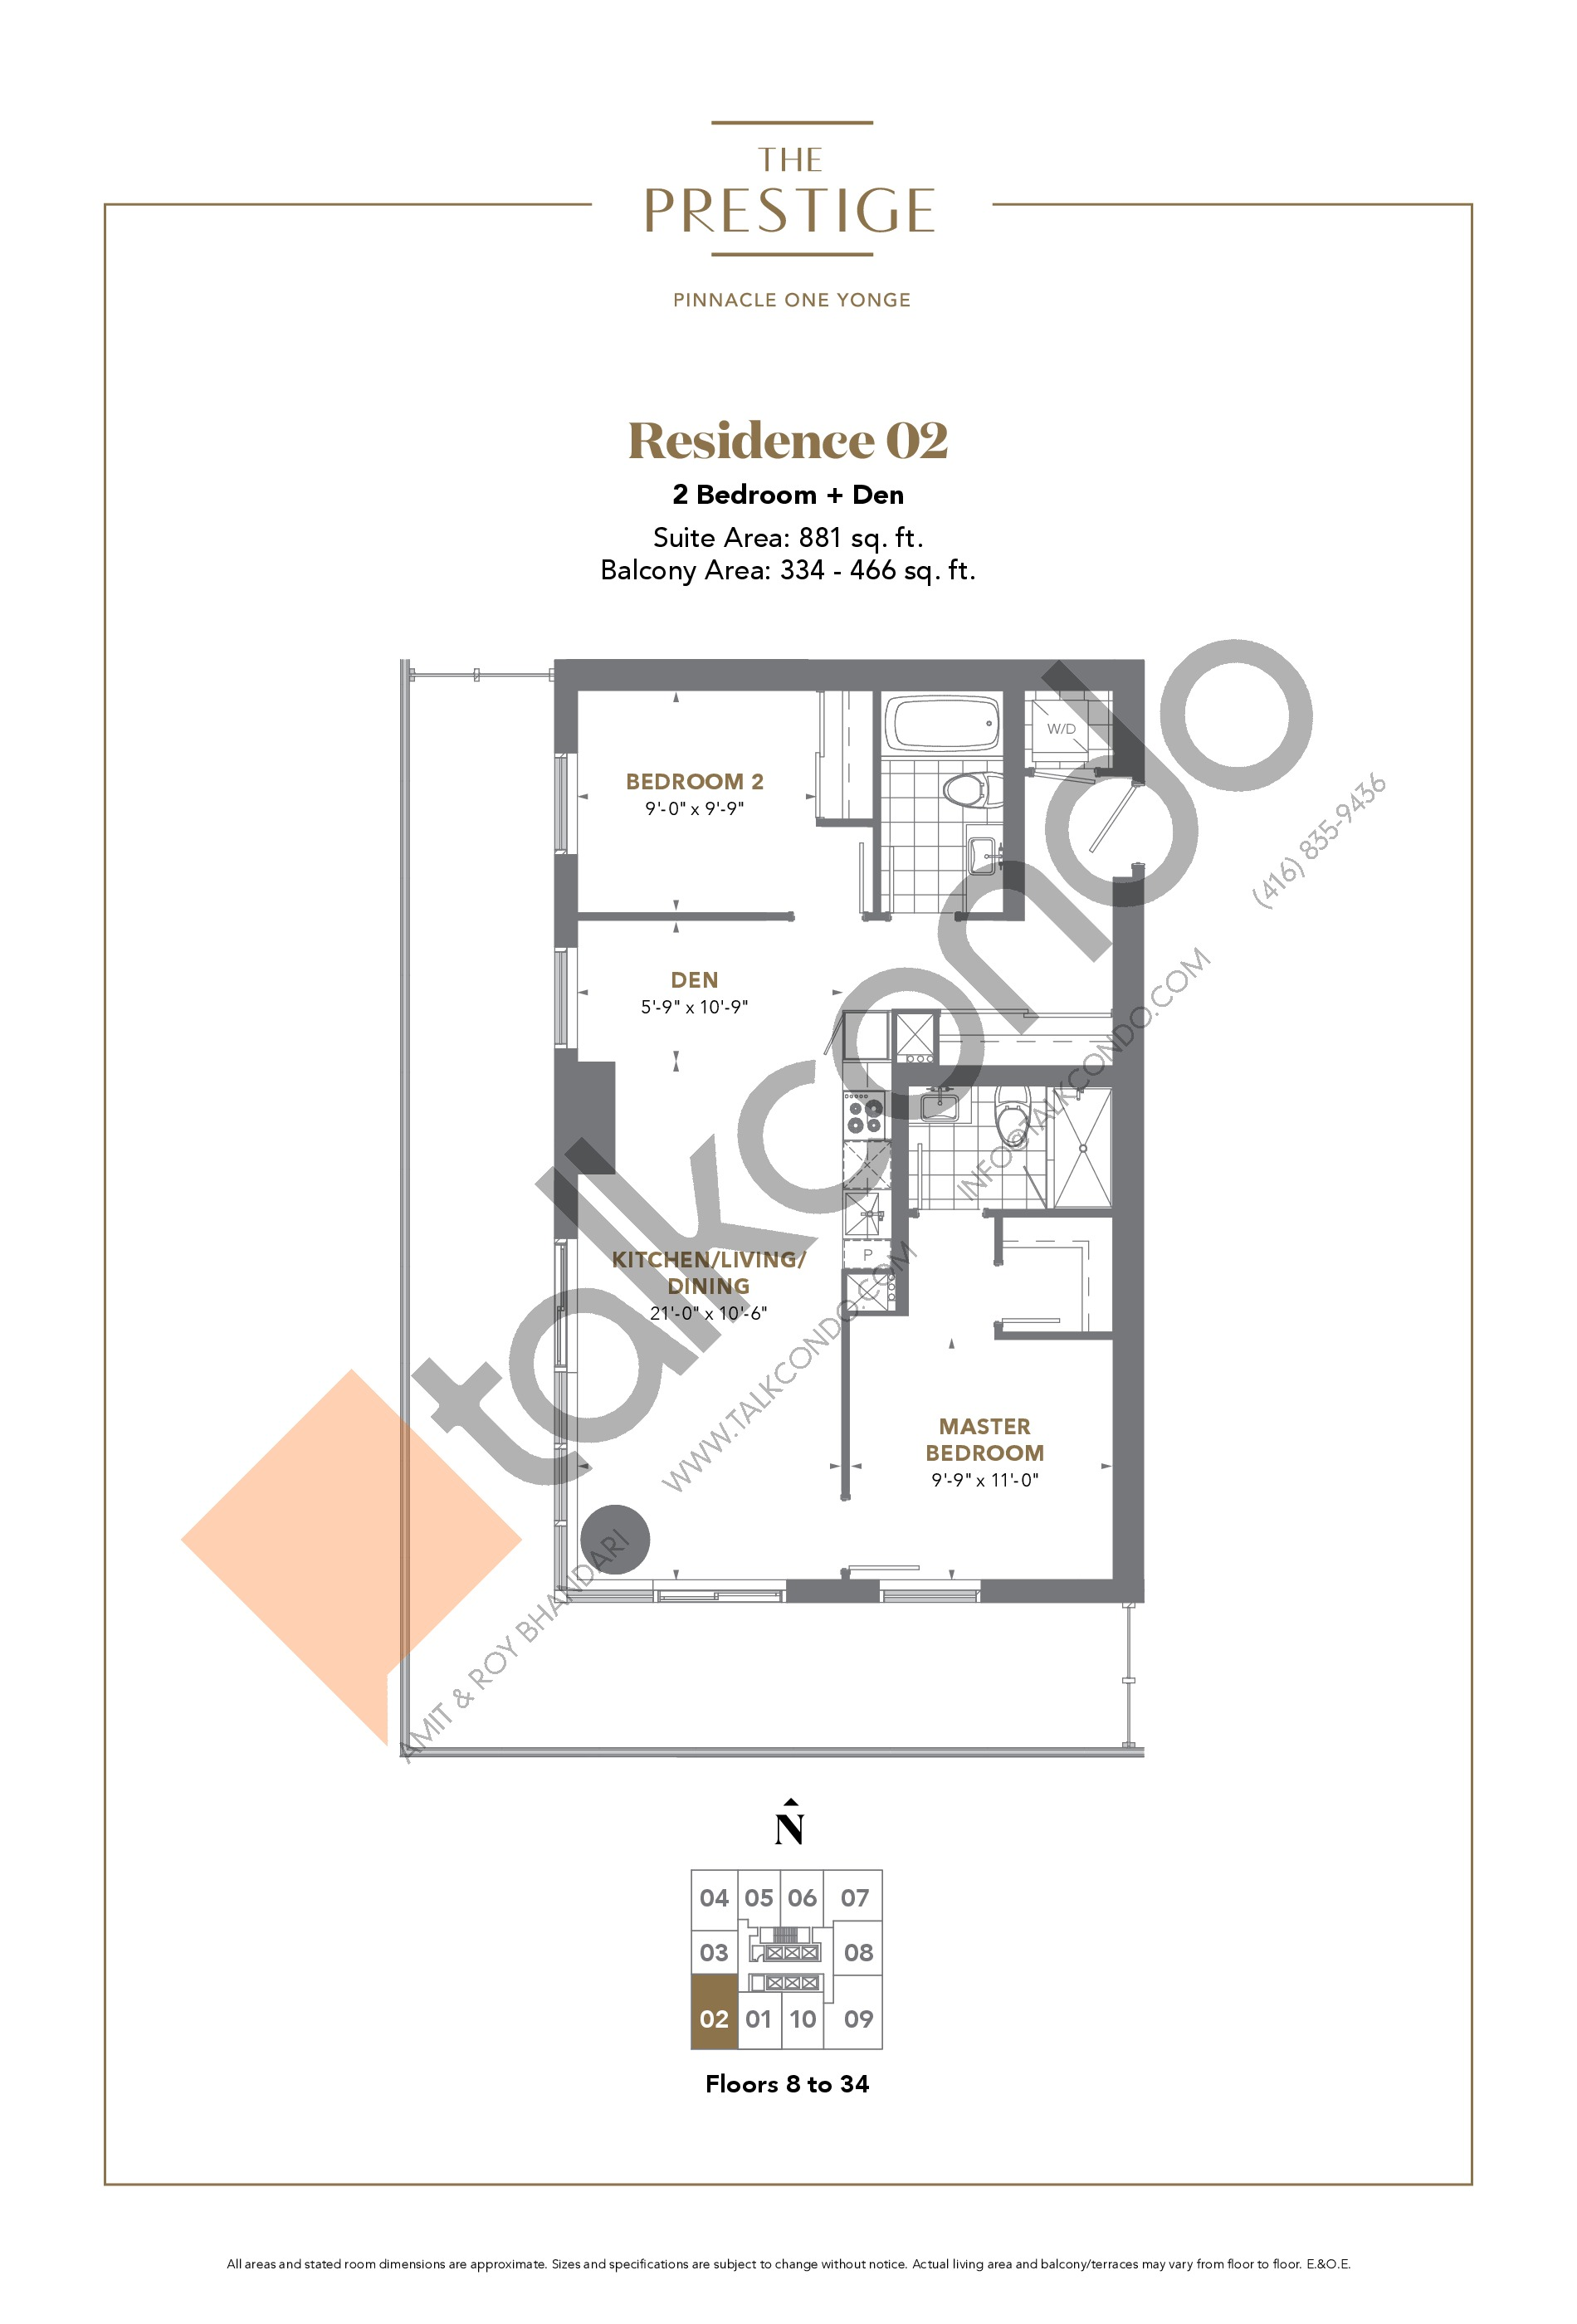 Residence 02 Floor Plan at The Prestige Condos at Pinnacle One Yonge - 881 sq.ft